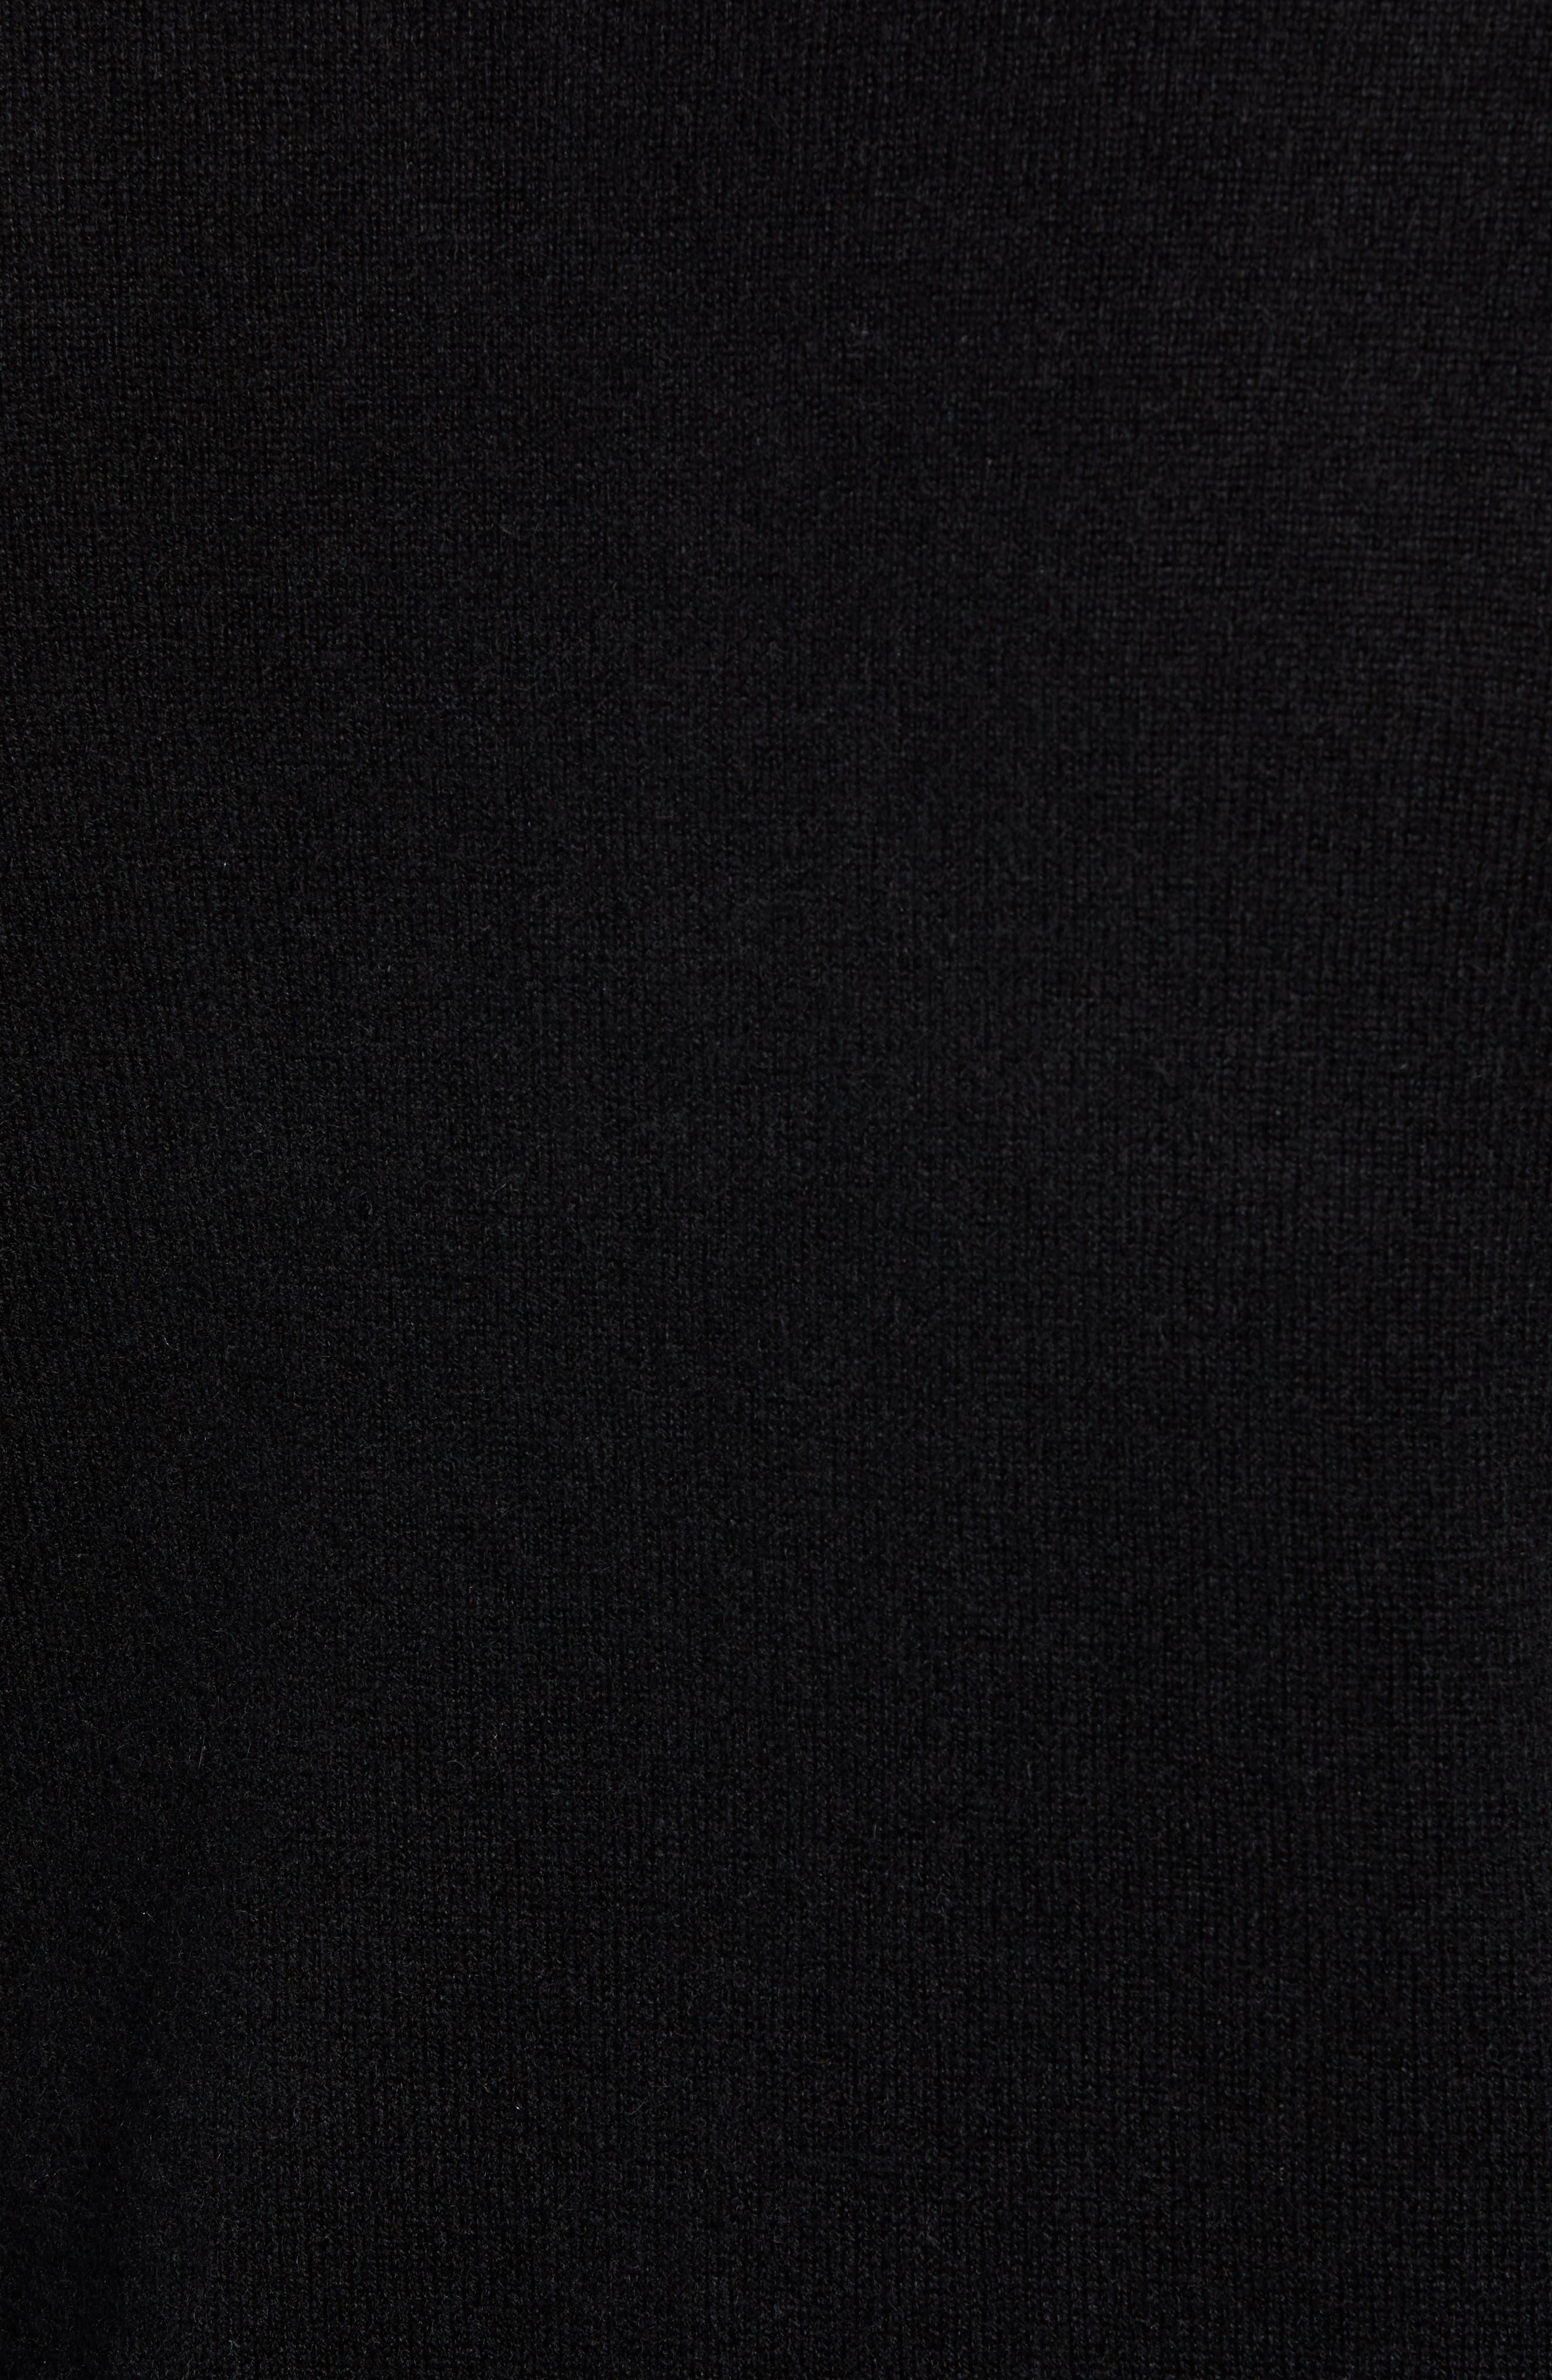 J.CREW,                             Everyday Cashmere Regular Fit V-Neck Sweater,                             Alternate thumbnail 5, color,                             001